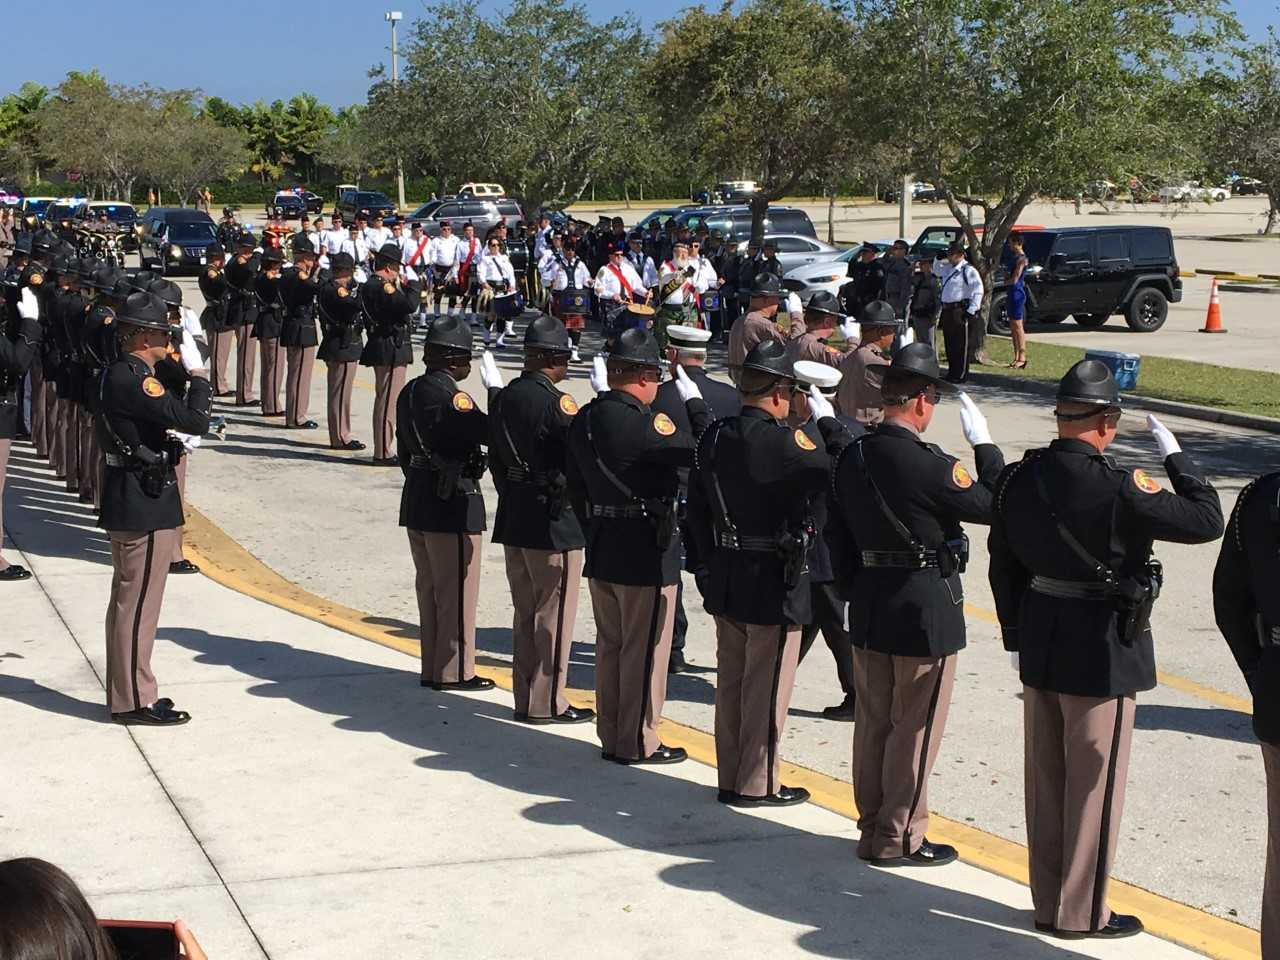 Hinton procession arrival 3.jpg